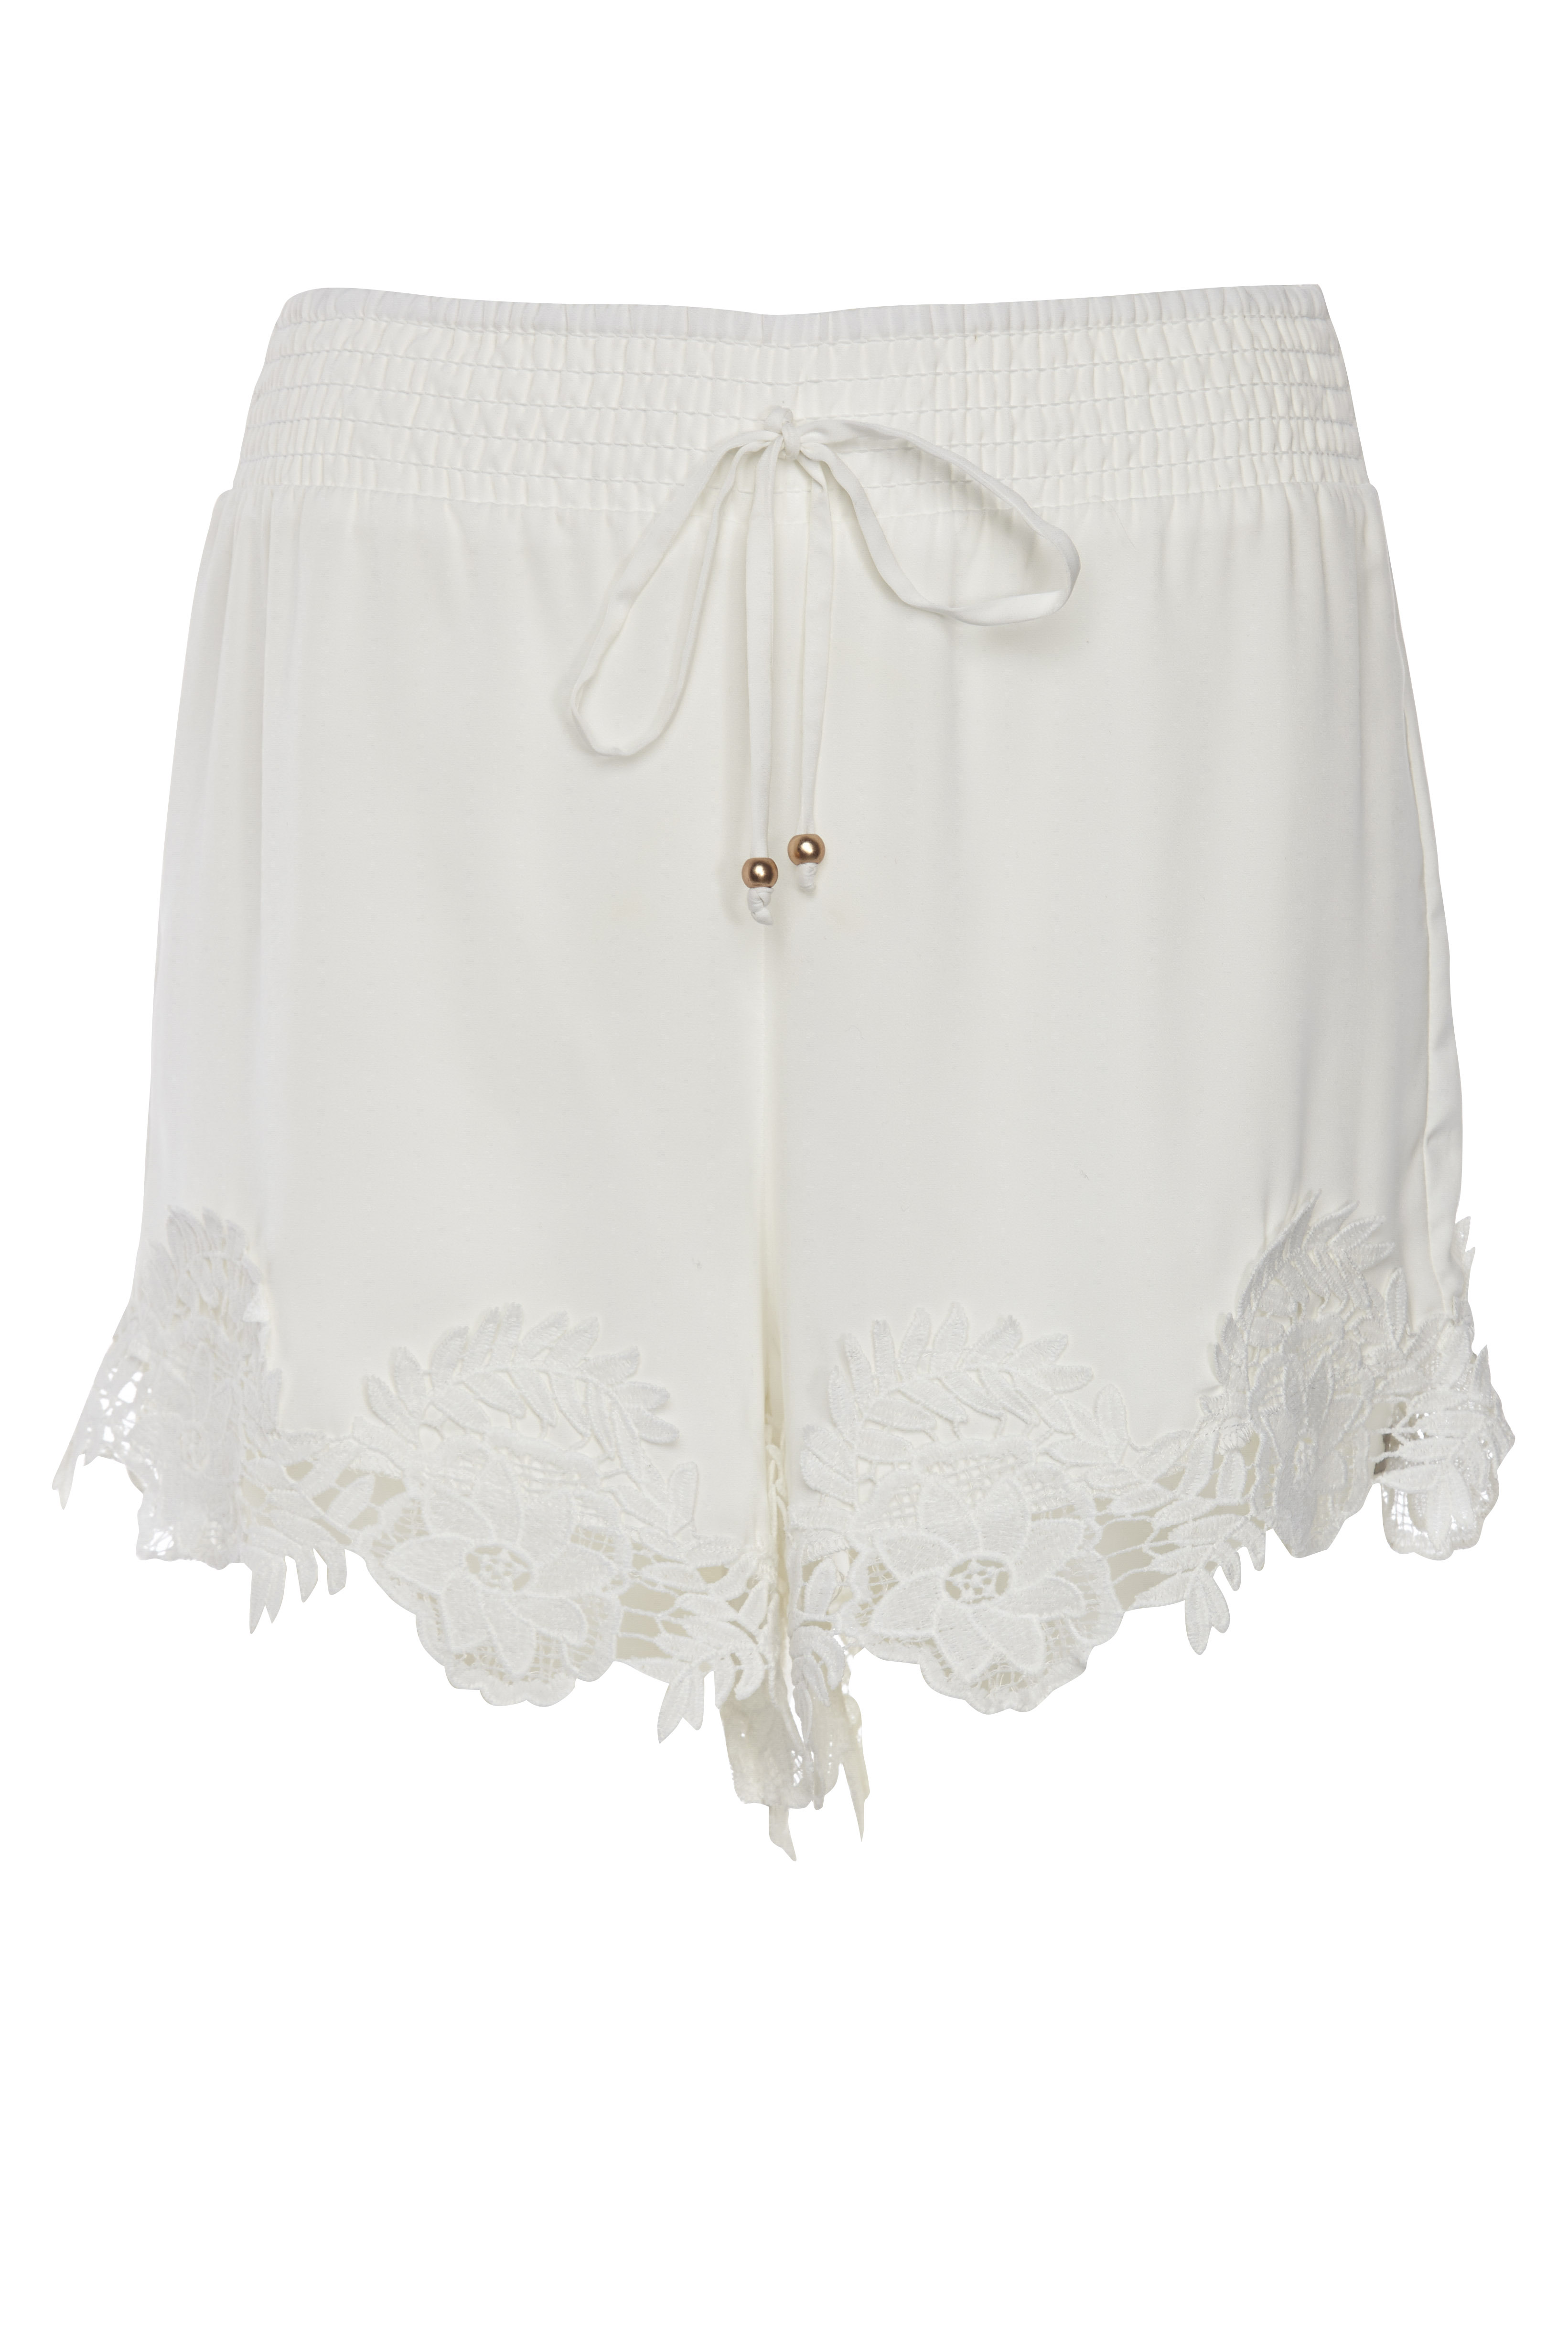 cotton-on-body_bridal-belle-short_nzd29-95_oct-nov-dec-2